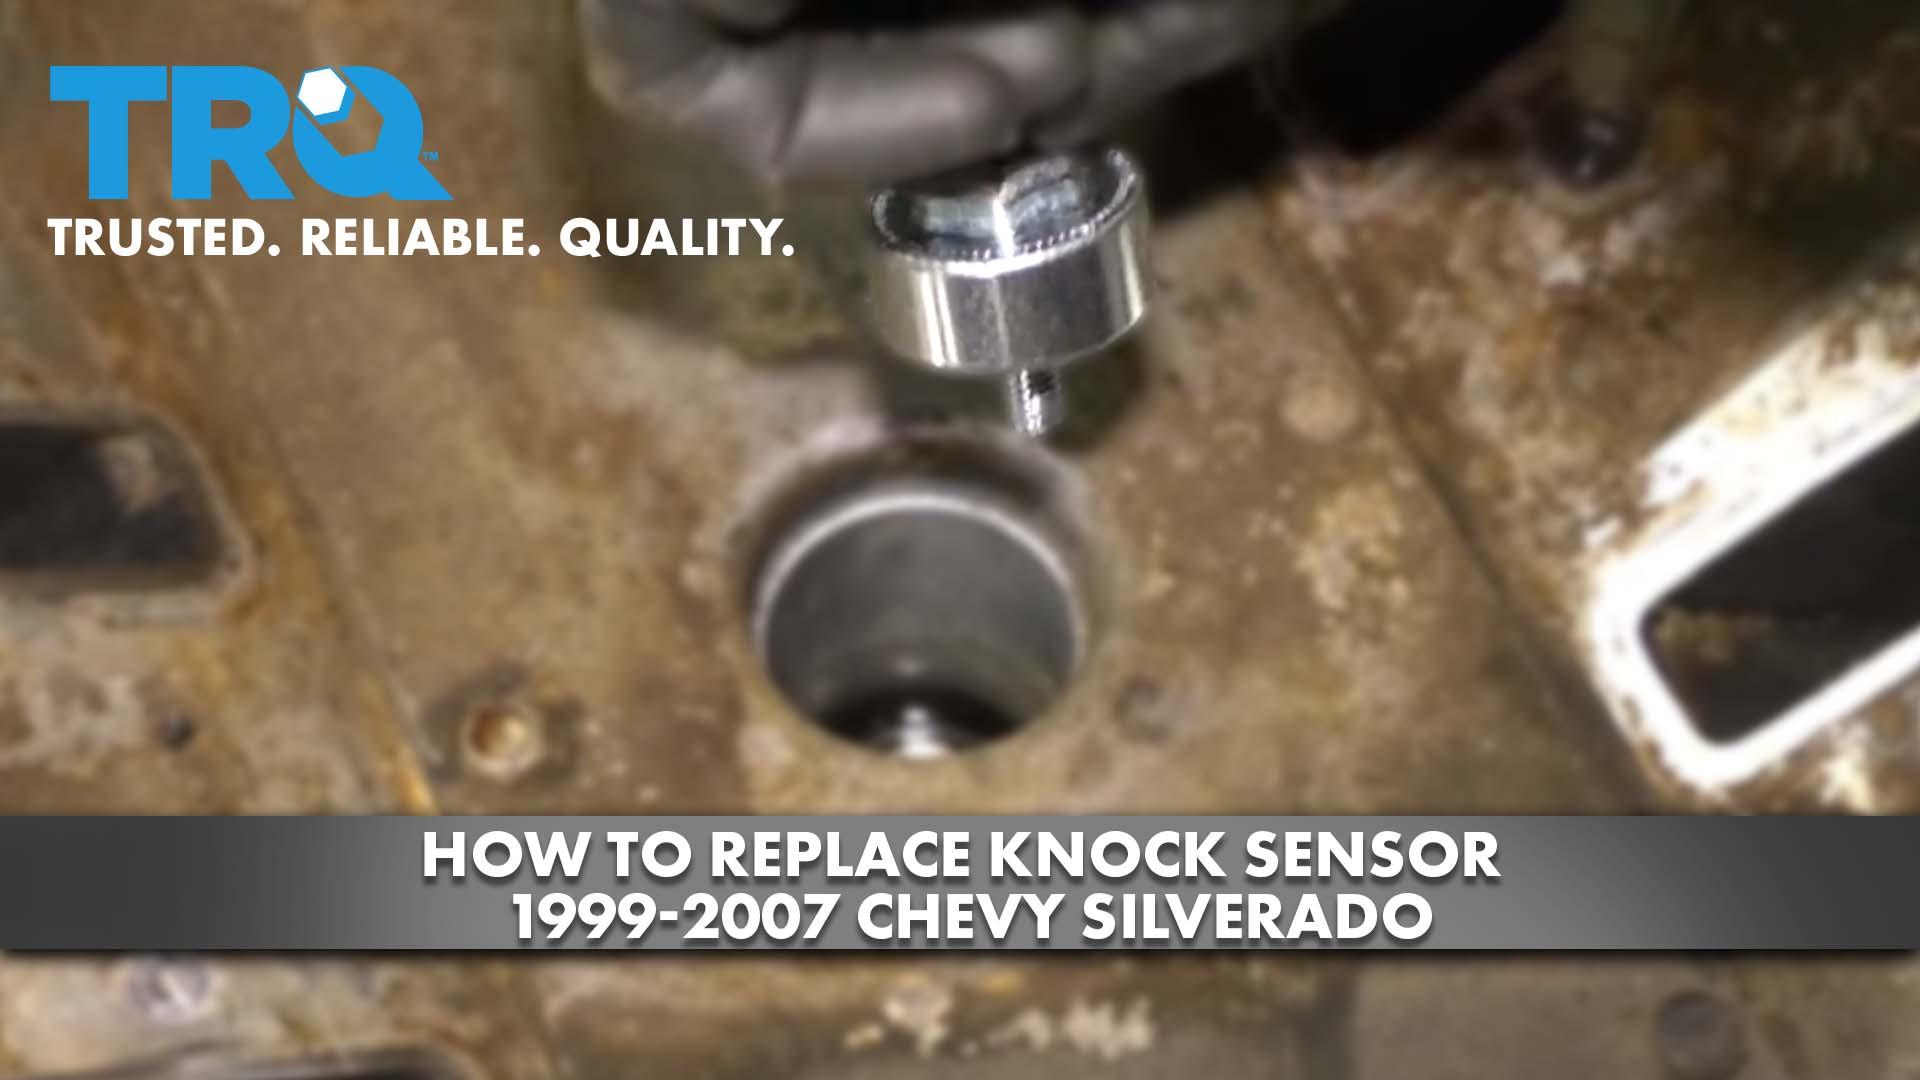 How to Replace Knock Sensors 1999-07 Chevy Silverado